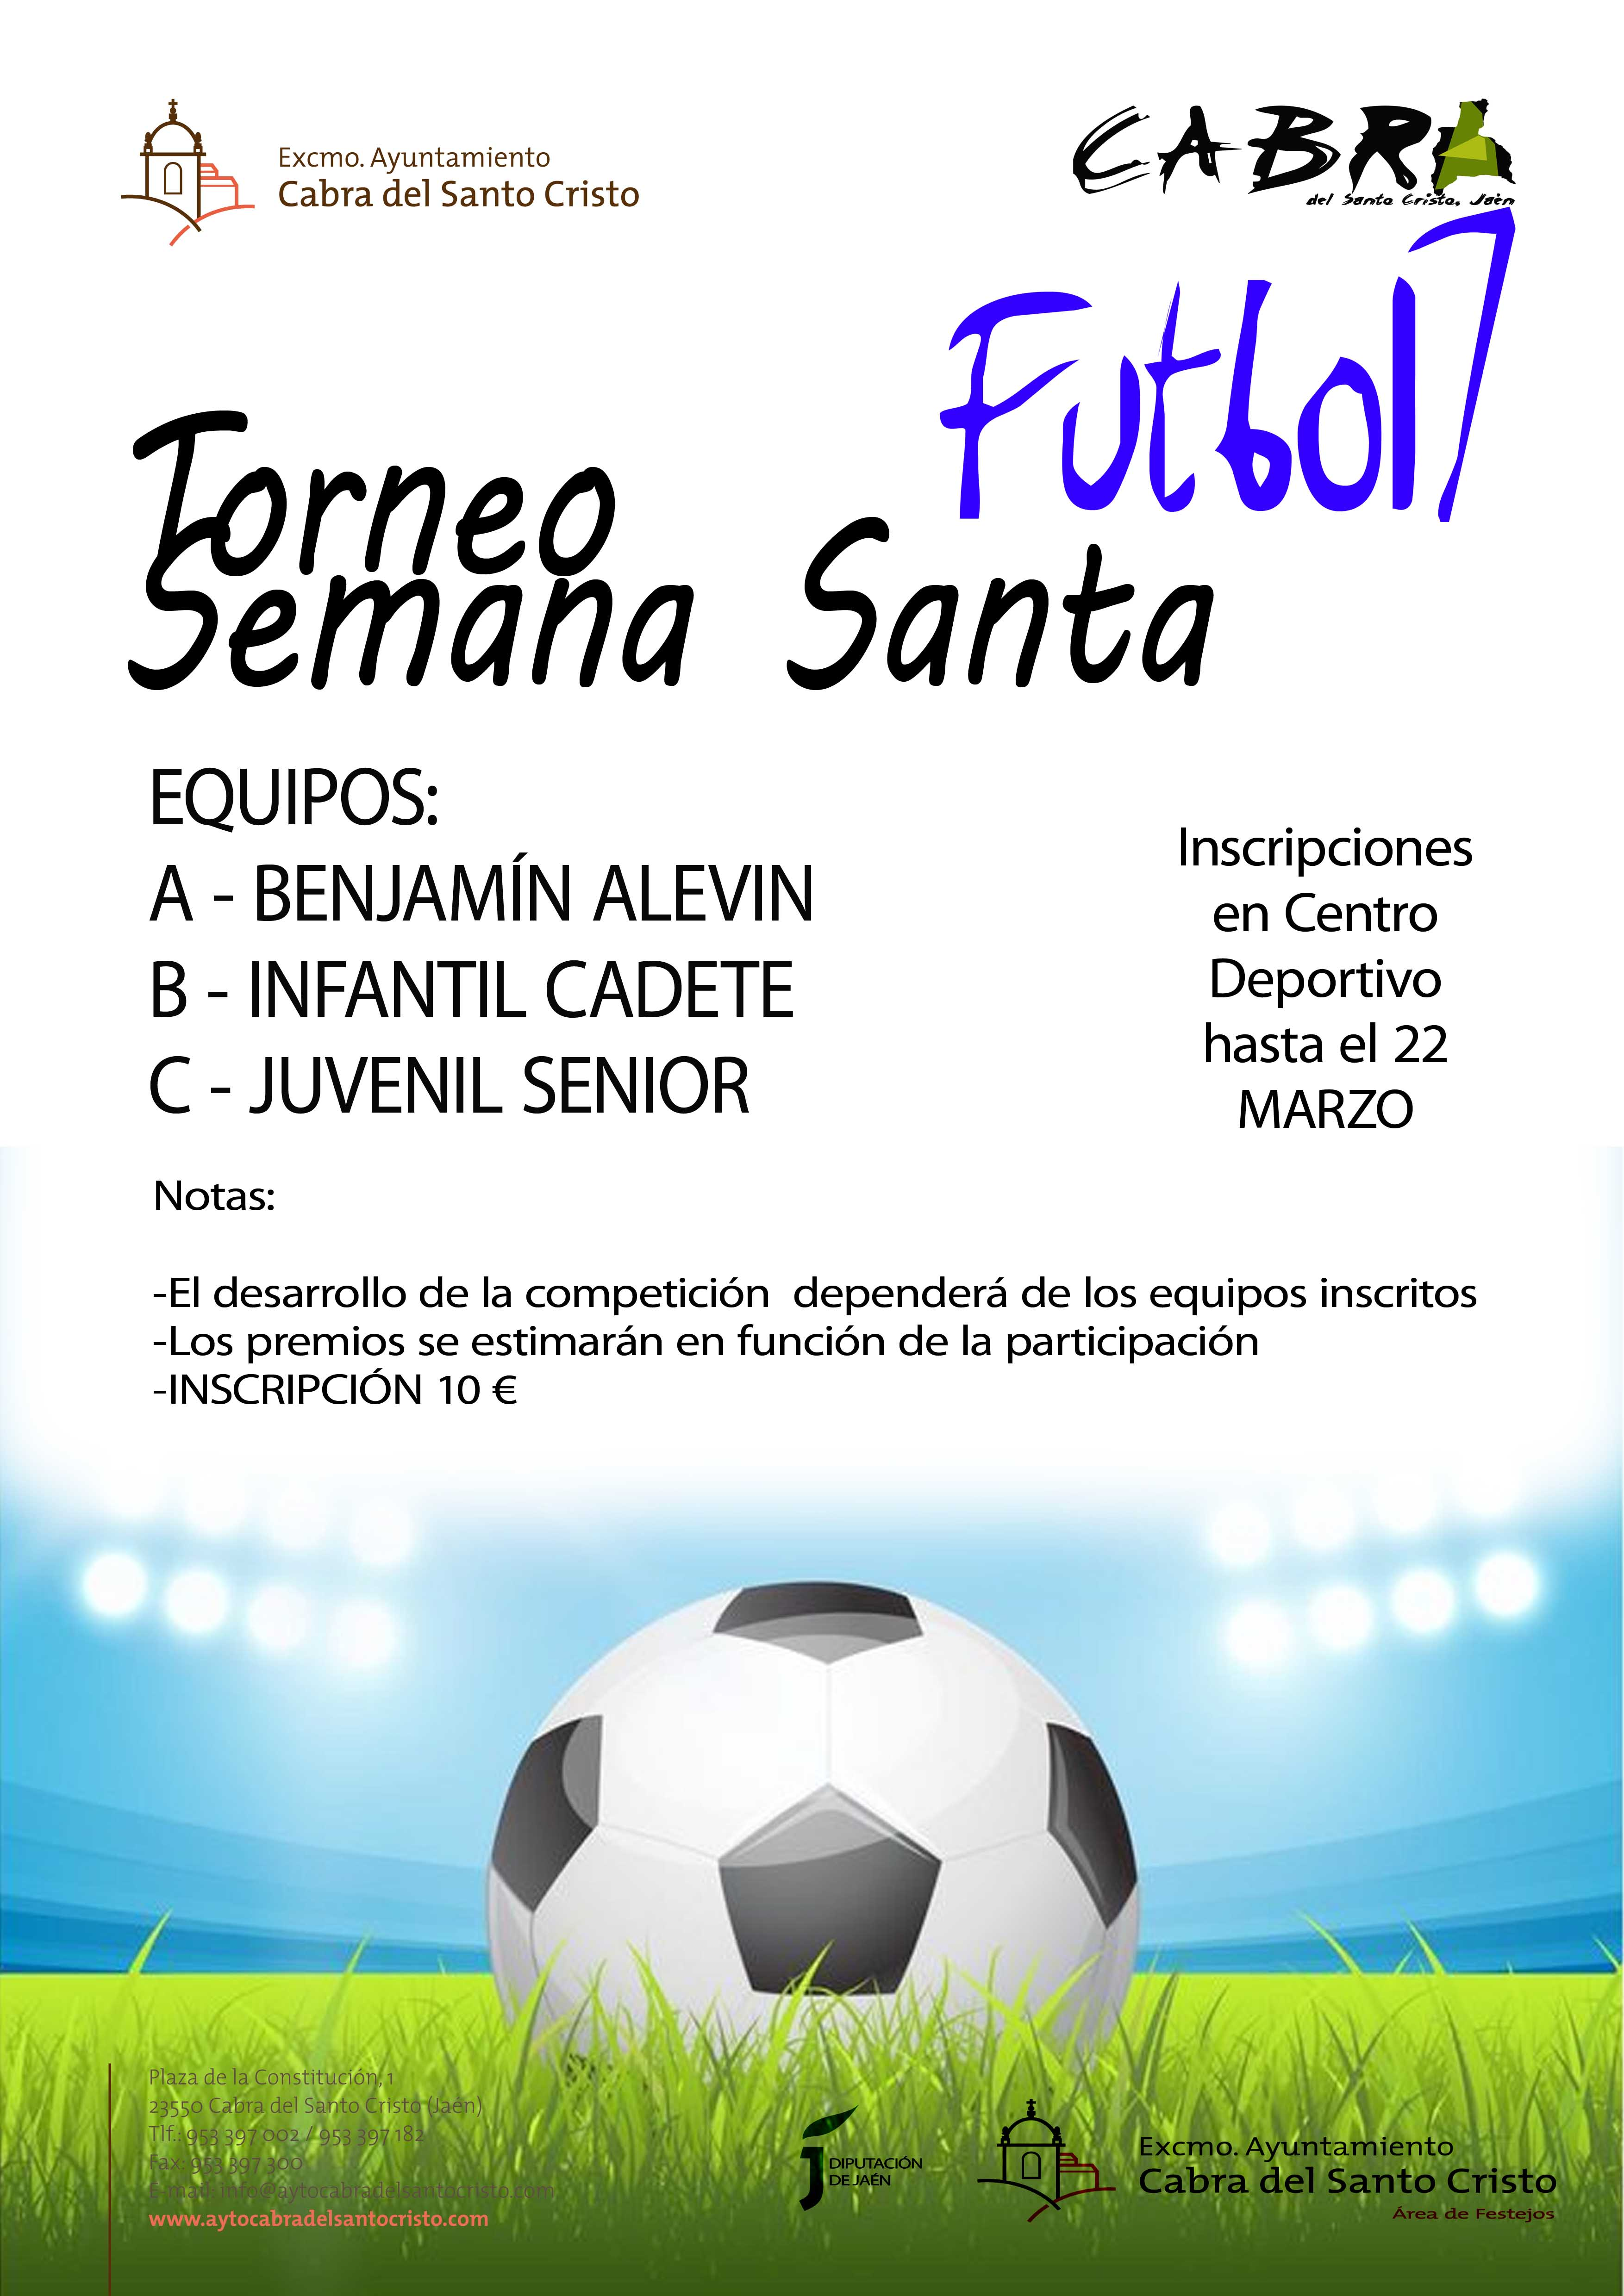 Torneo Local Fútbol 7 de Semana Santa